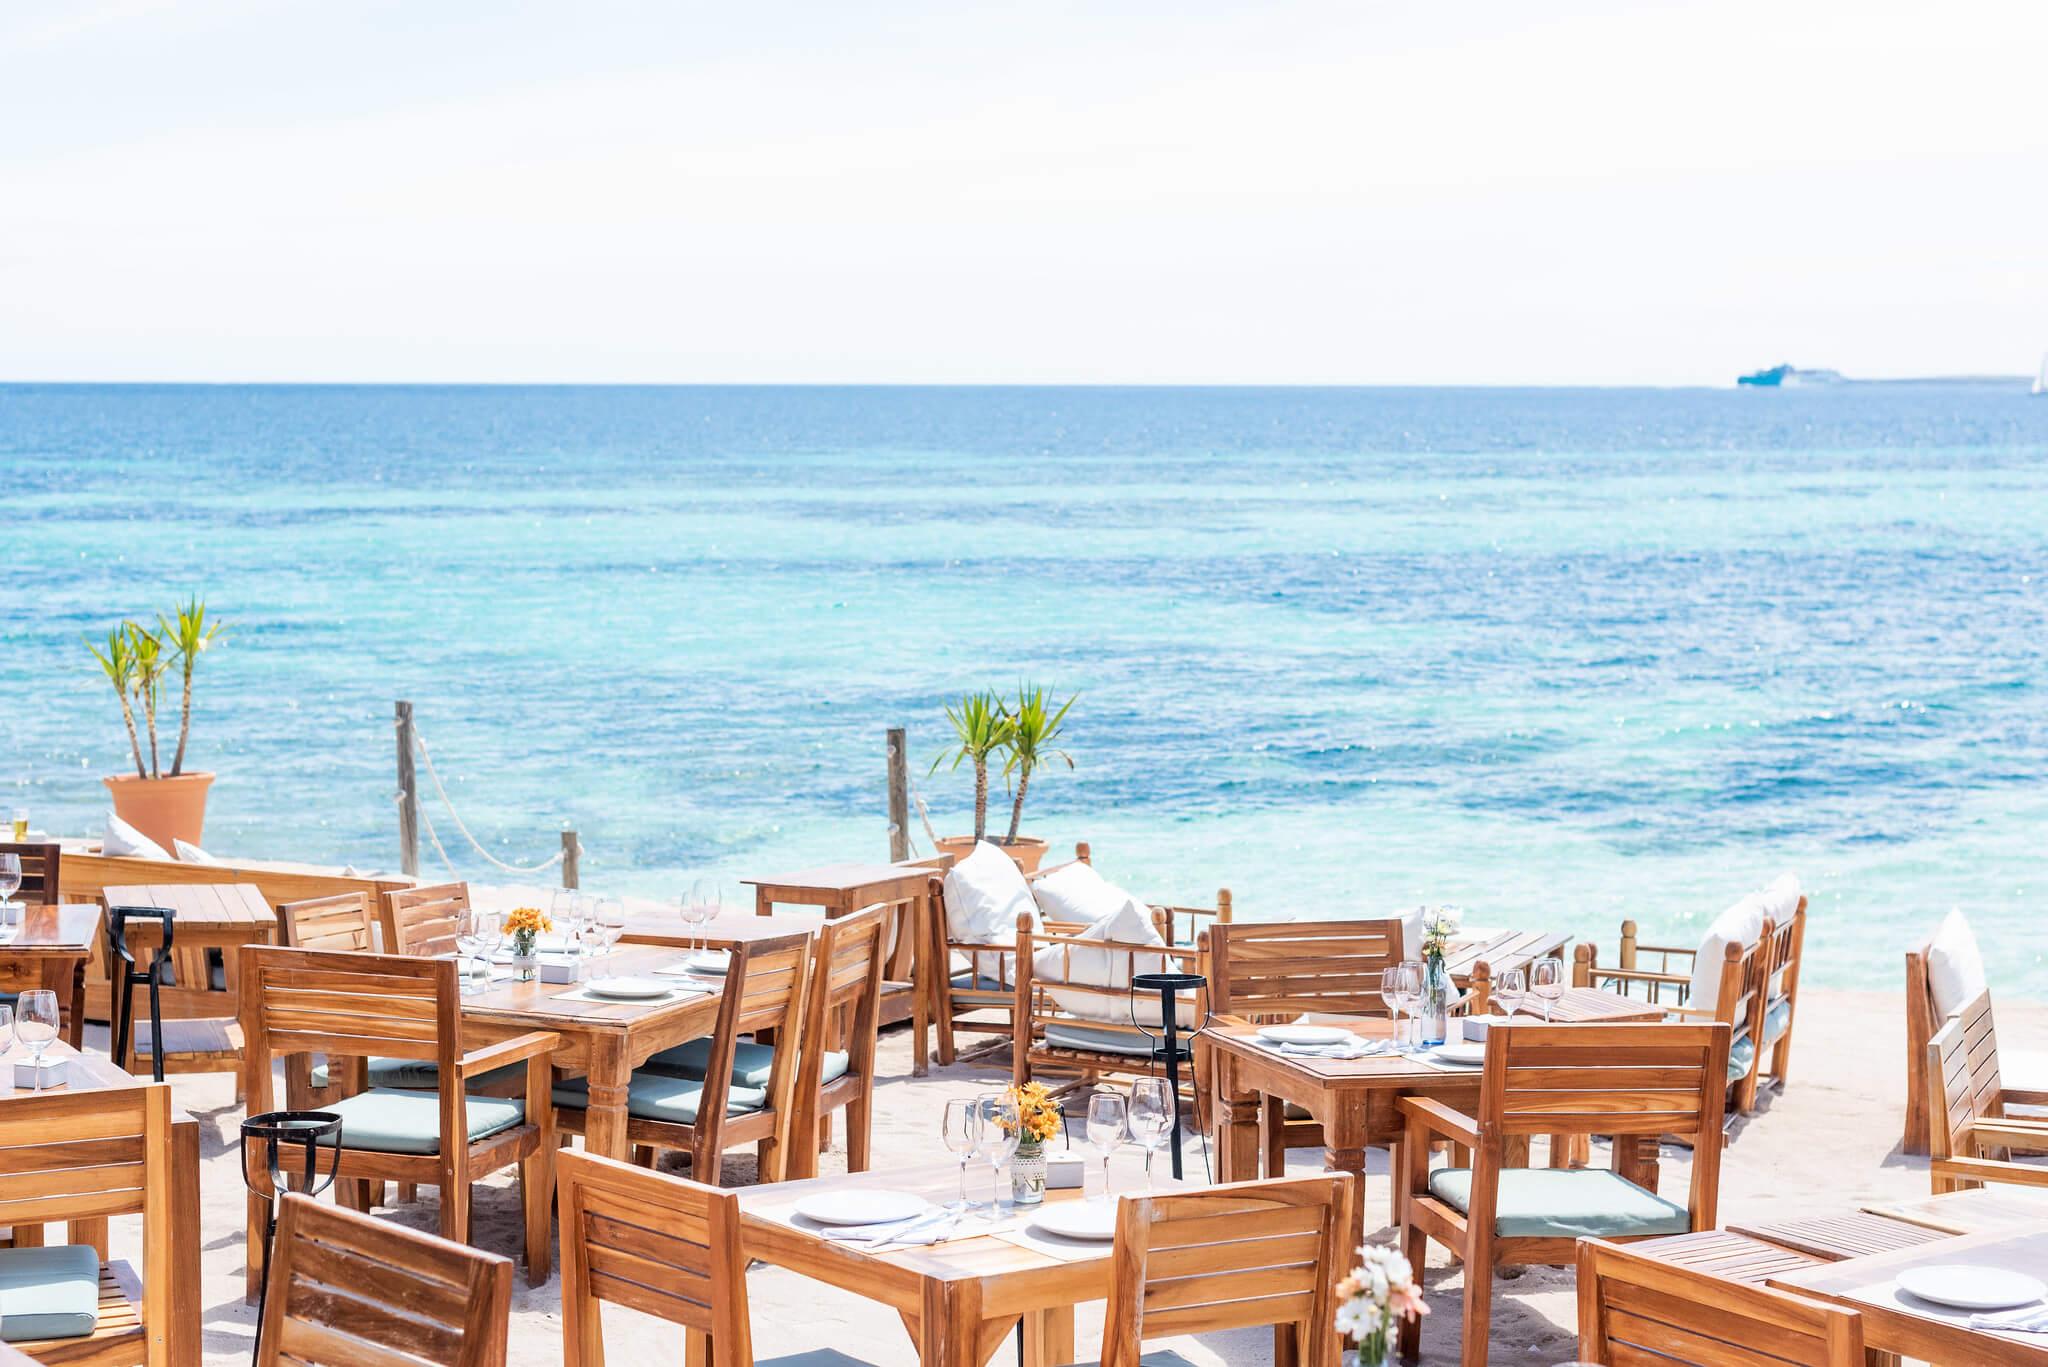 https://www.white-ibiza.com/wp-content/uploads/2020/03/ibiza-restaurants-la-escollera-2018-11.jpg